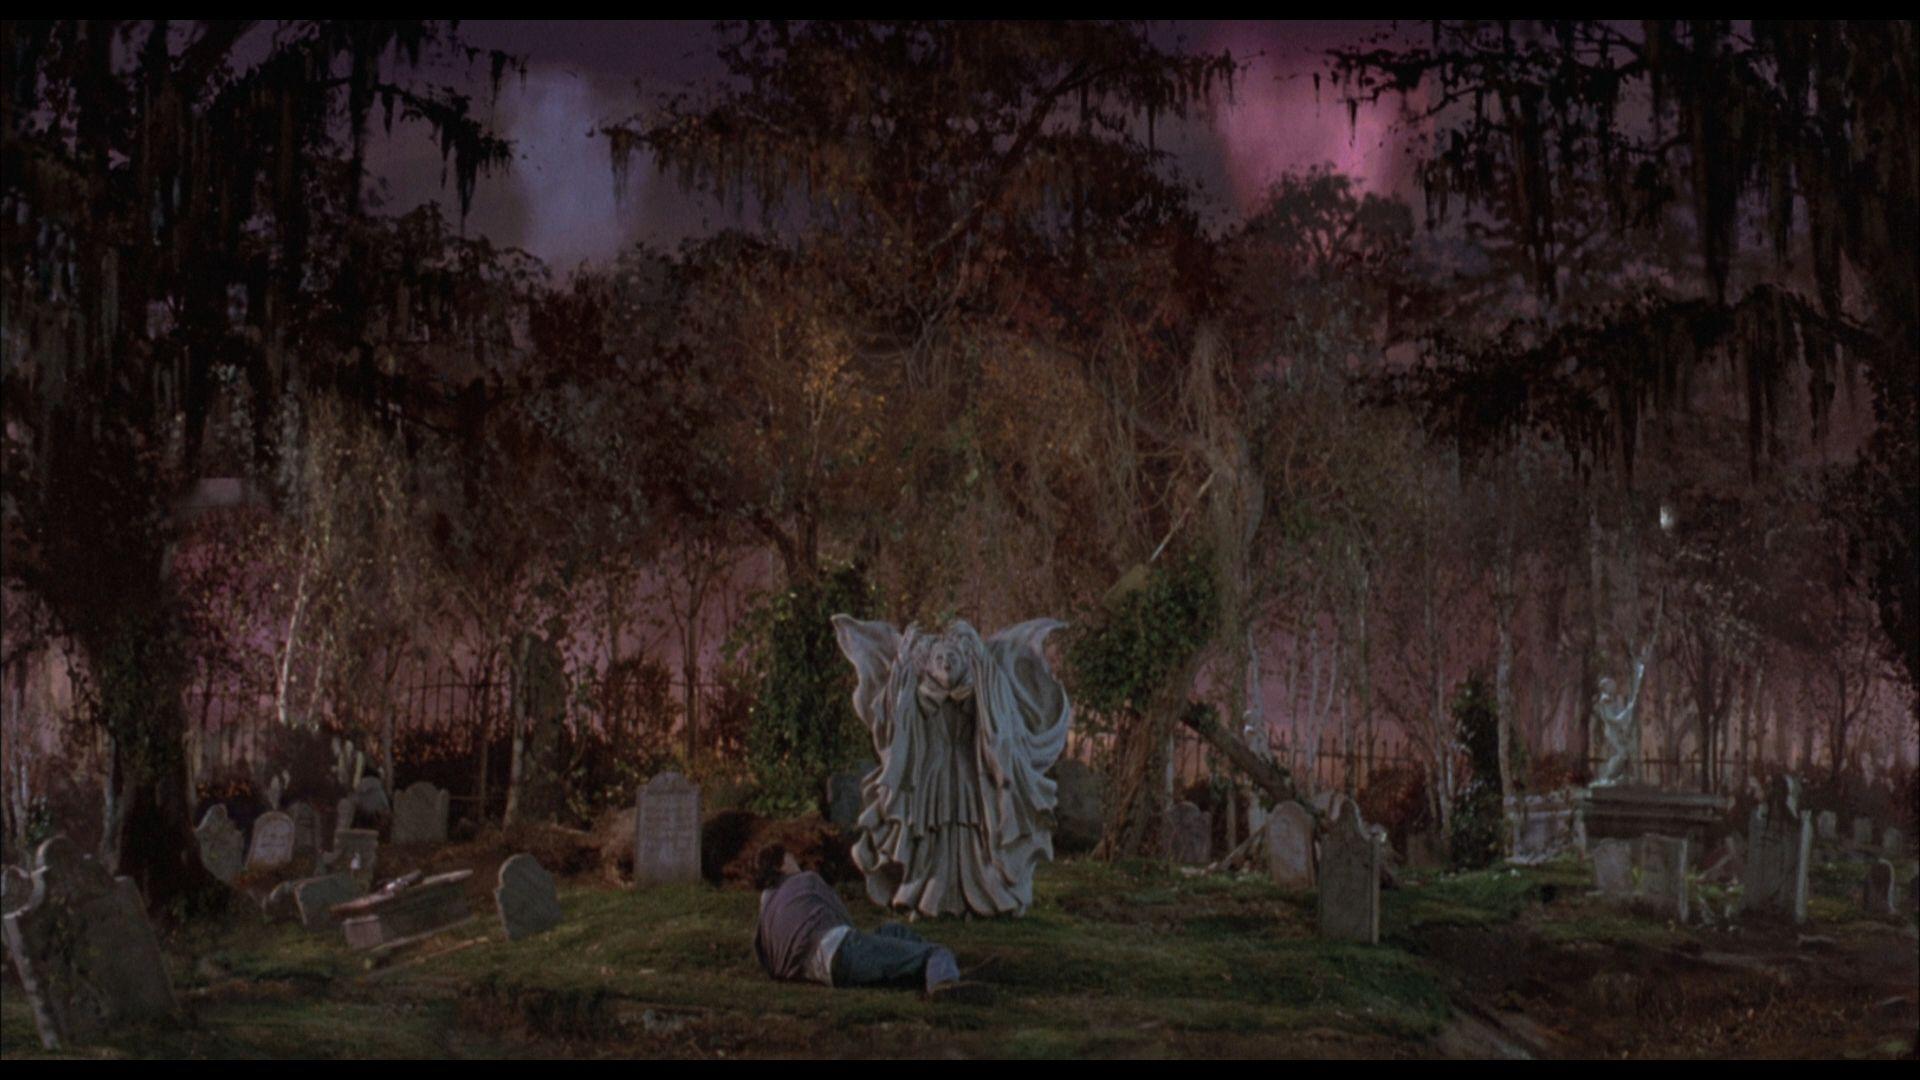 Hocus Pocus Movie Scene Getting Inspired For Hallowe En